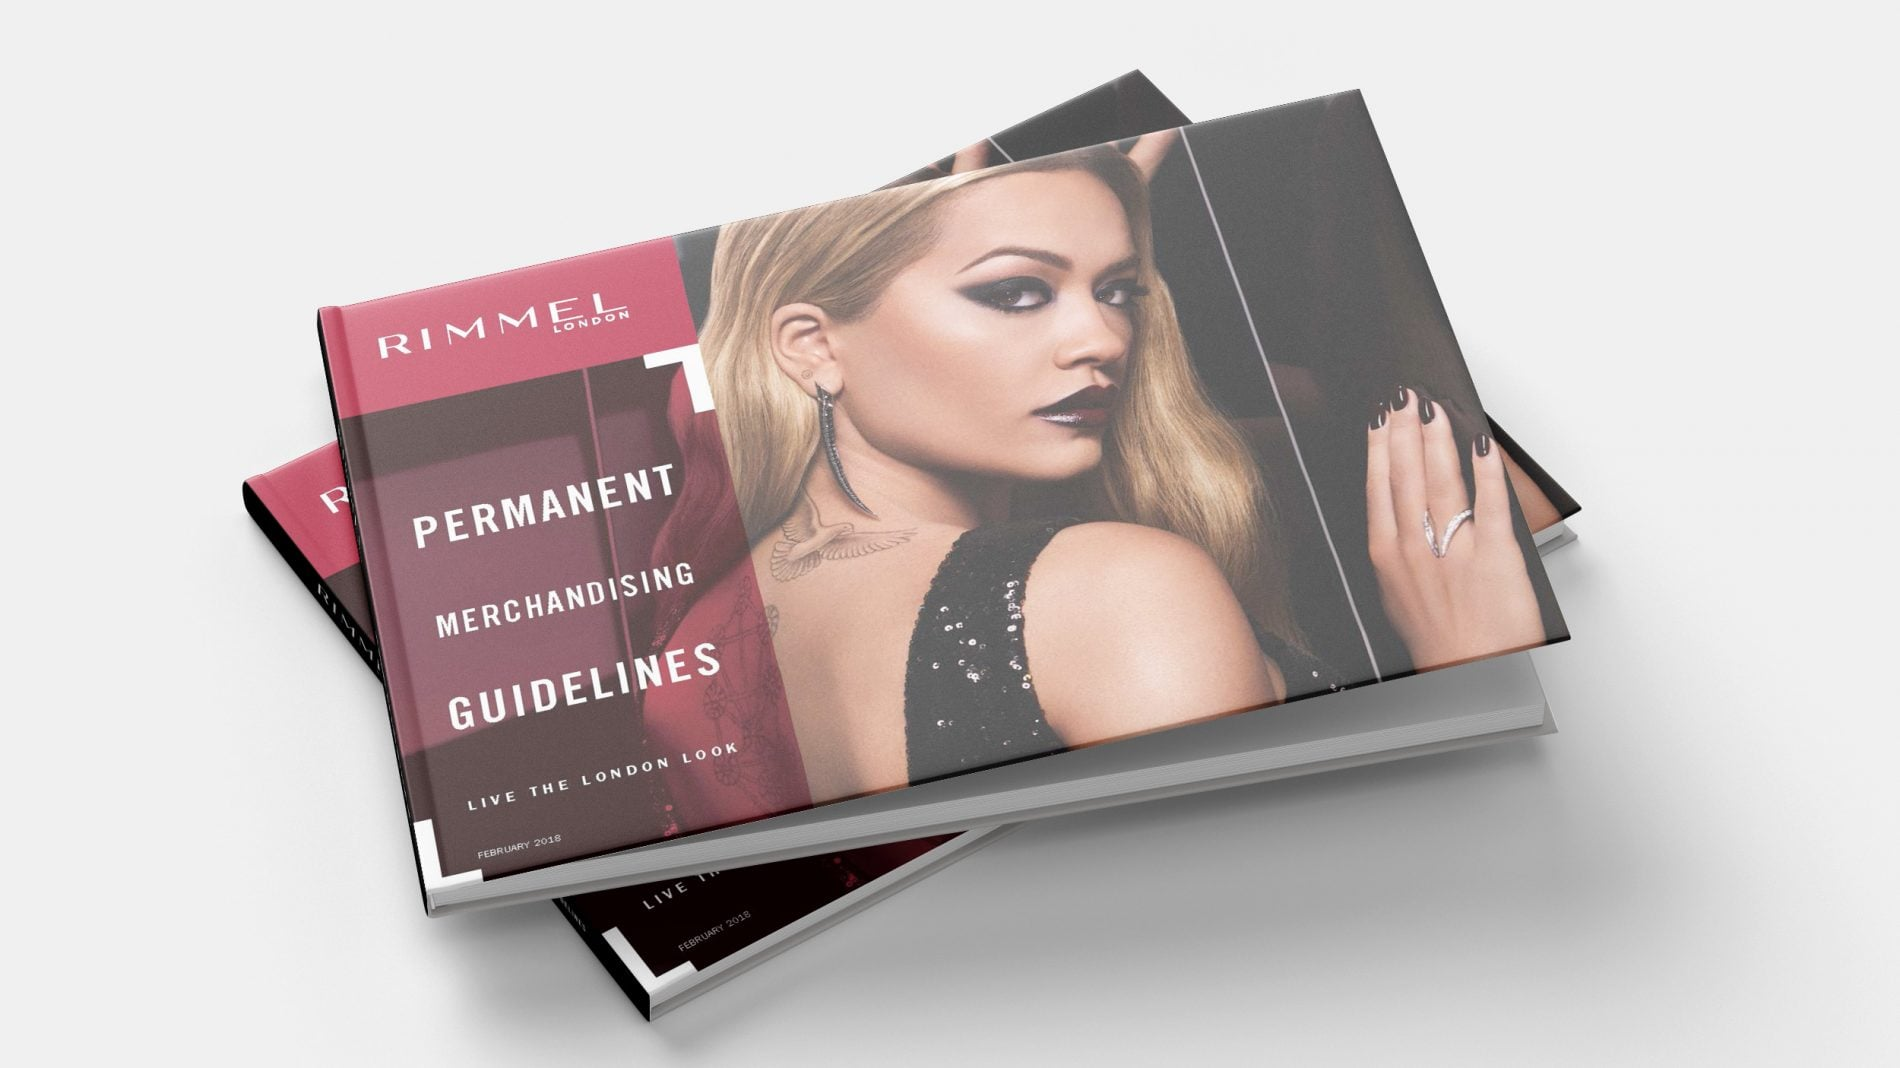 cover of rimmel merchandising guidelines